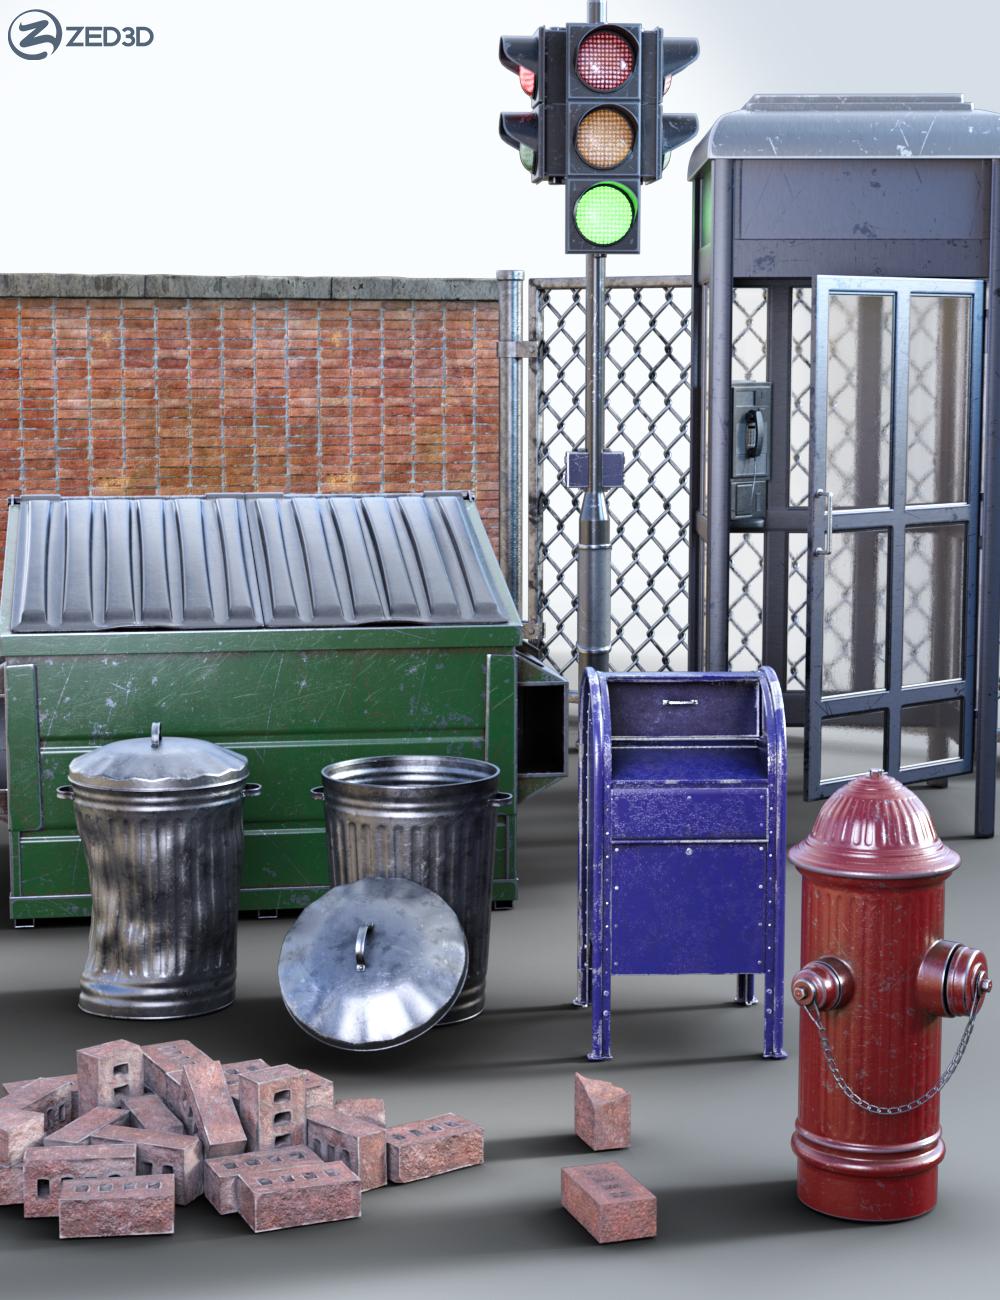 Z Urban Street Scene Essentials by: Zeddicuss, 3D Models by Daz 3D